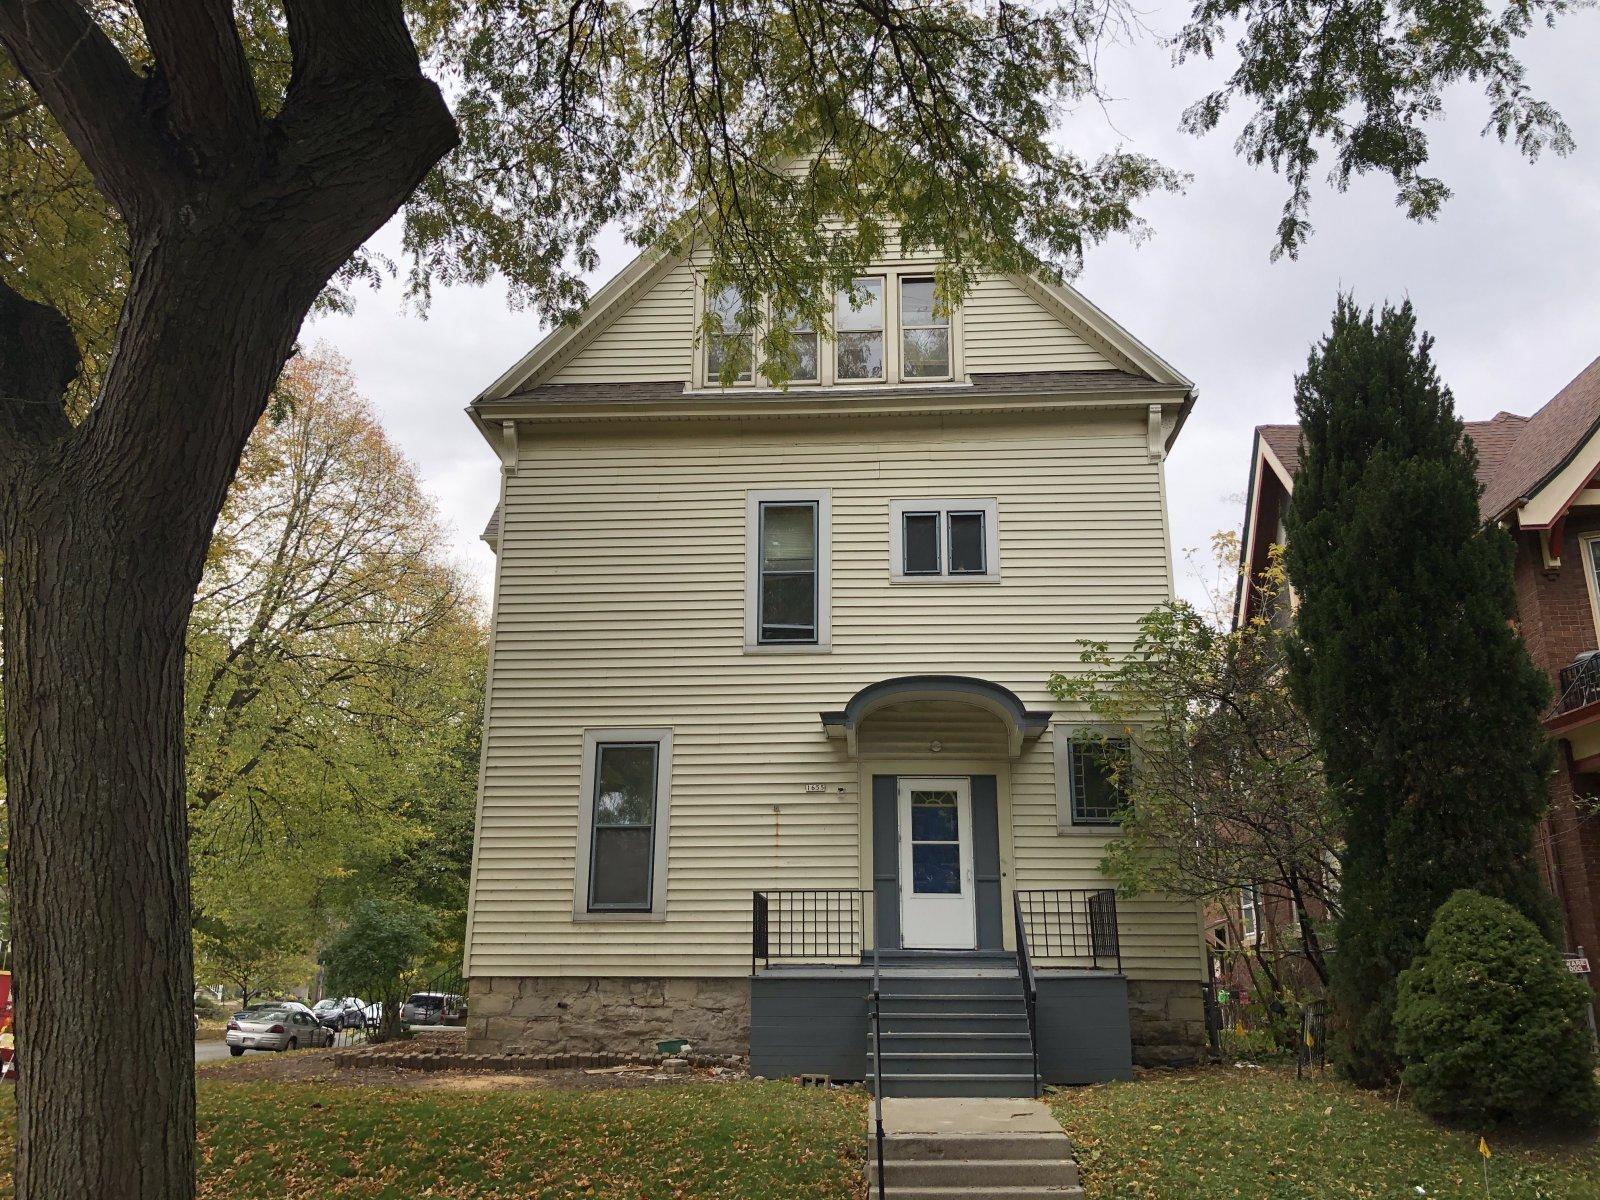 1655 N. Humboldt Ave.